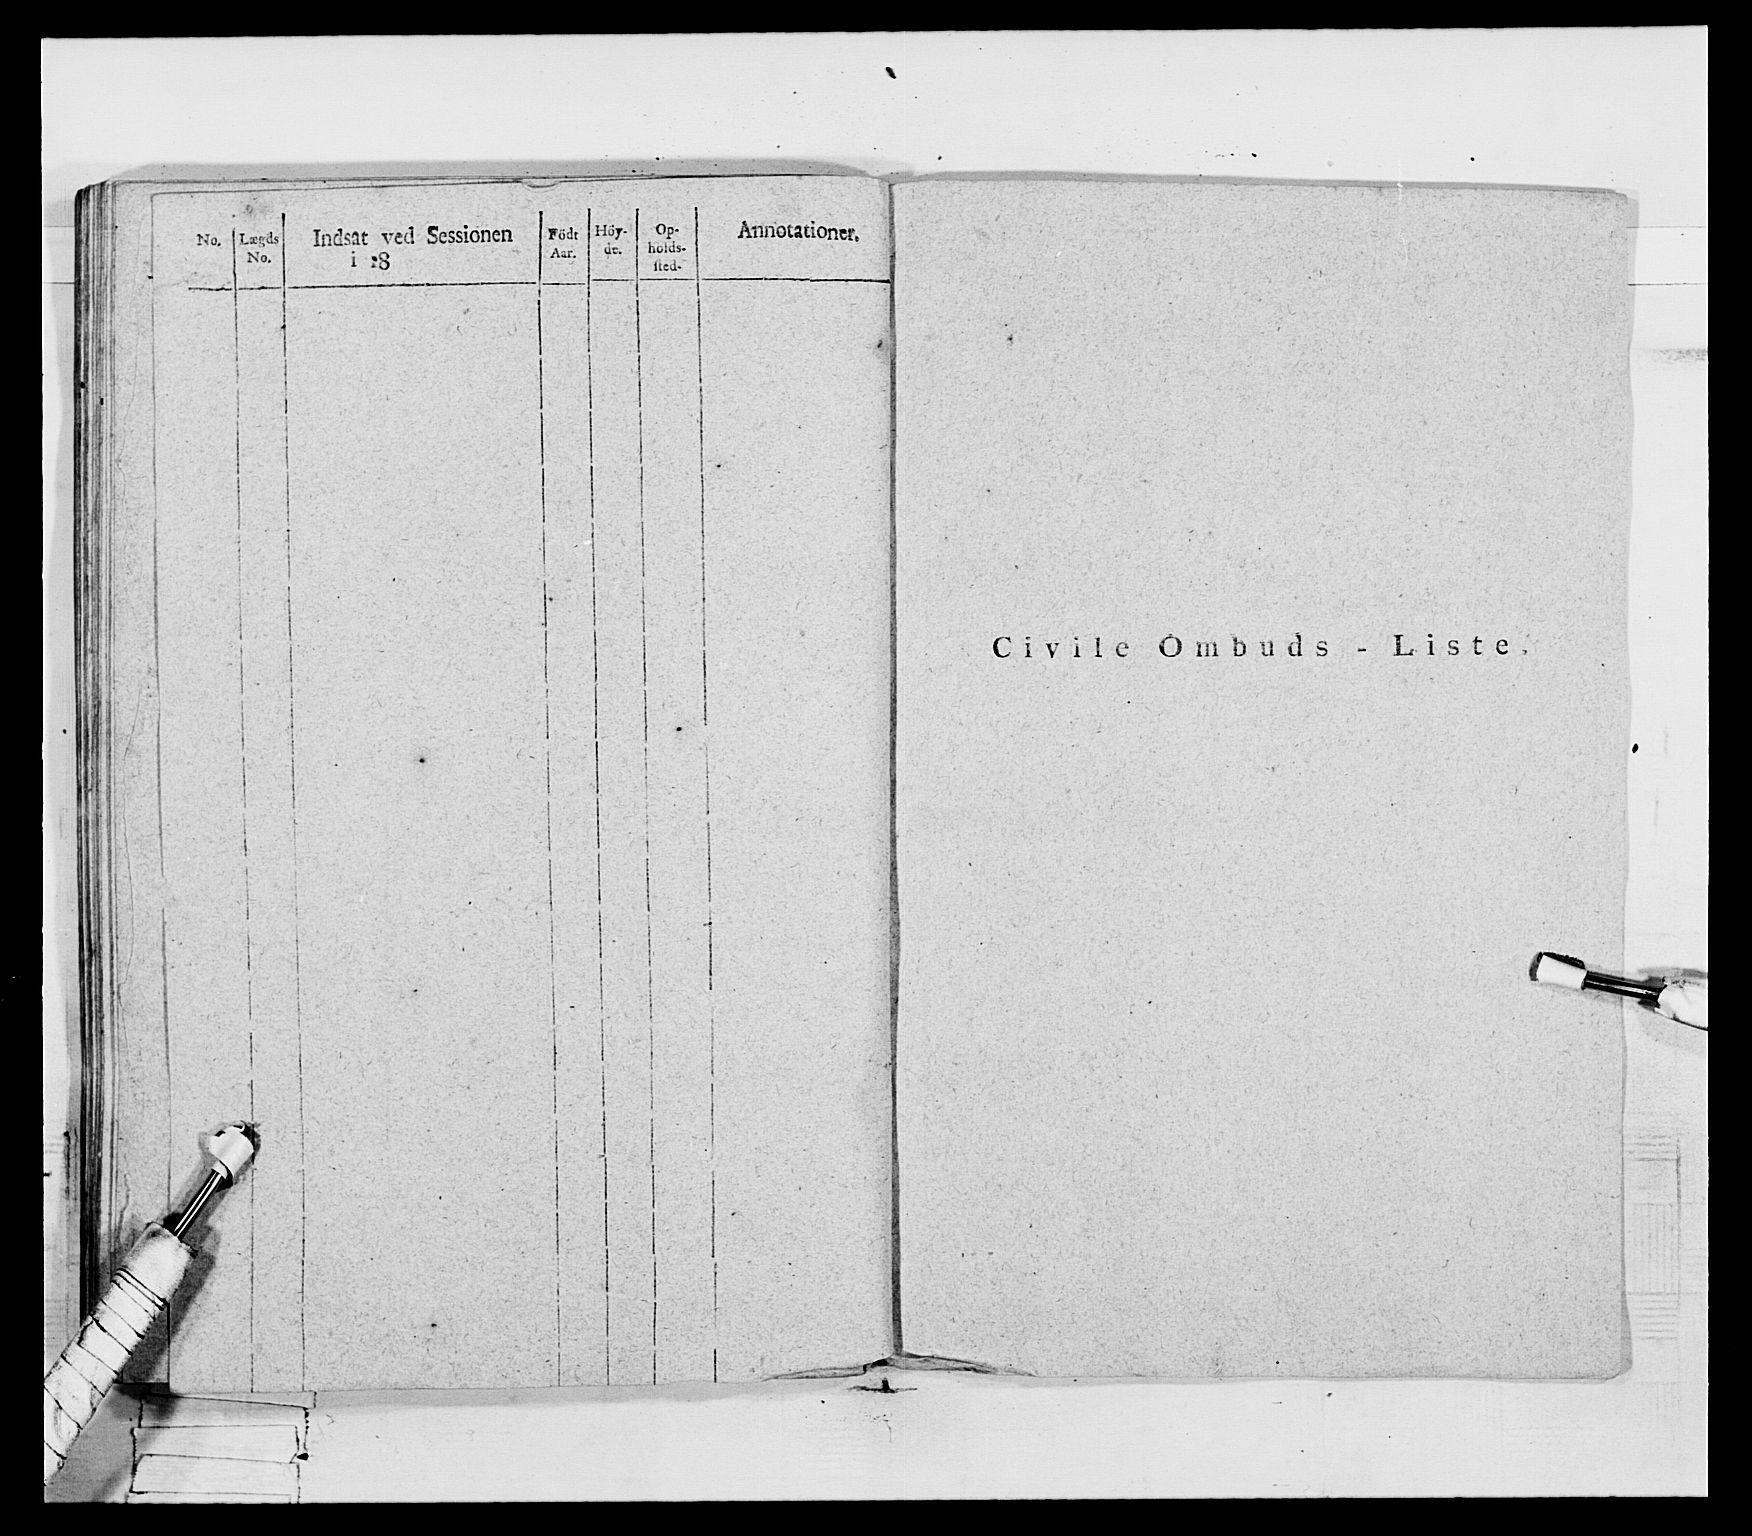 RA, Generalitets- og kommissariatskollegiet, Det kongelige norske kommissariatskollegium, E/Eh/L0069: Opplandske gevorbne infanteriregiment, 1810-1818, s. 154